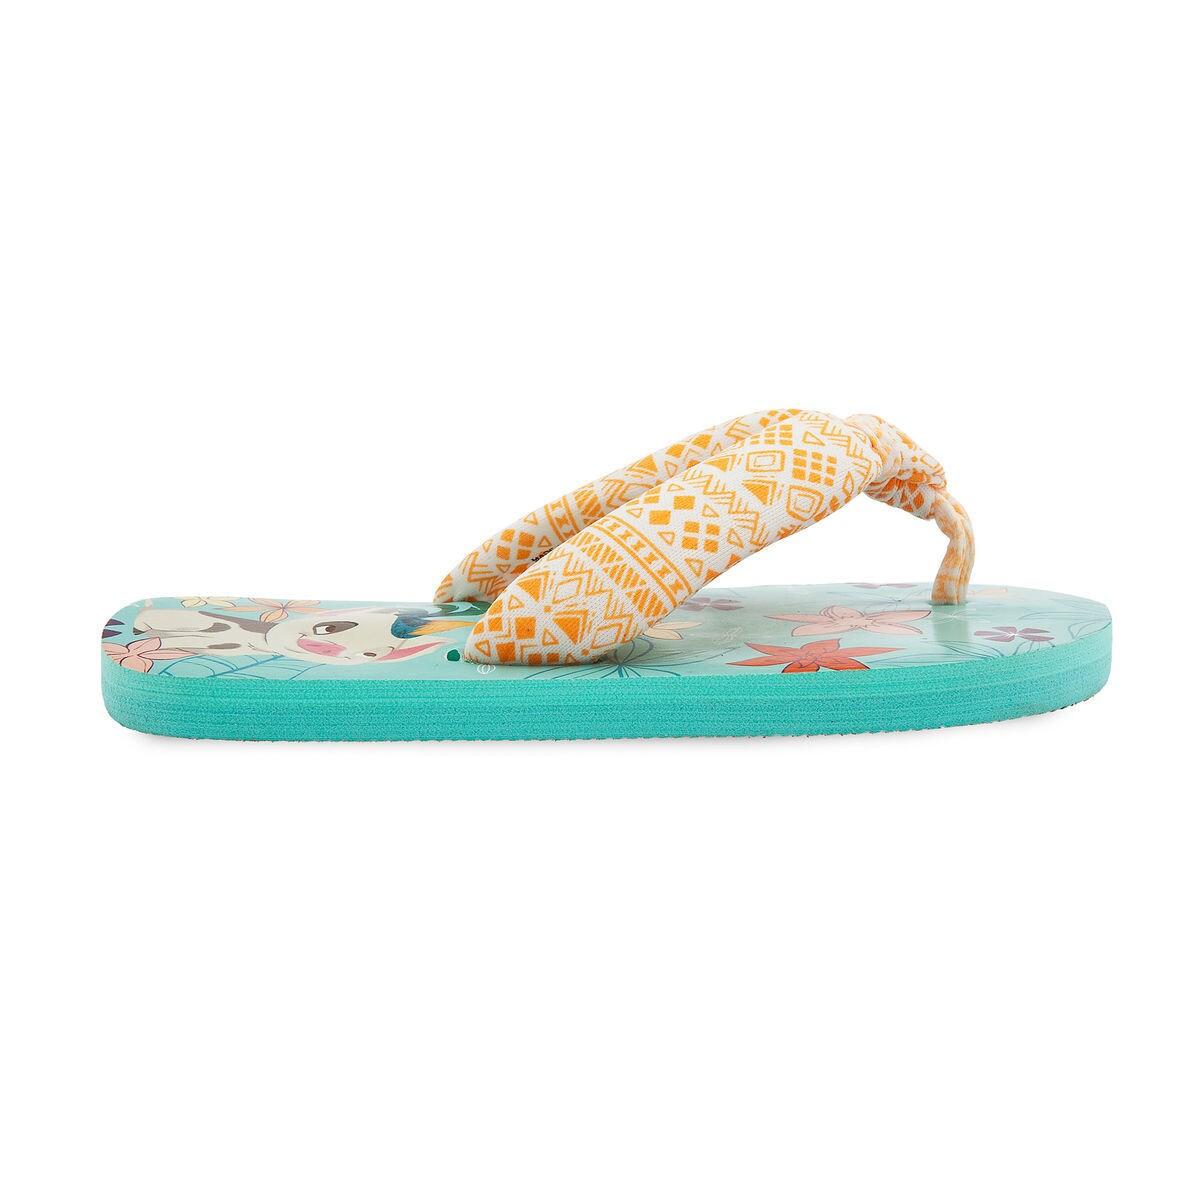 a03c2aa682e493 Moana Flip Flops for Kids